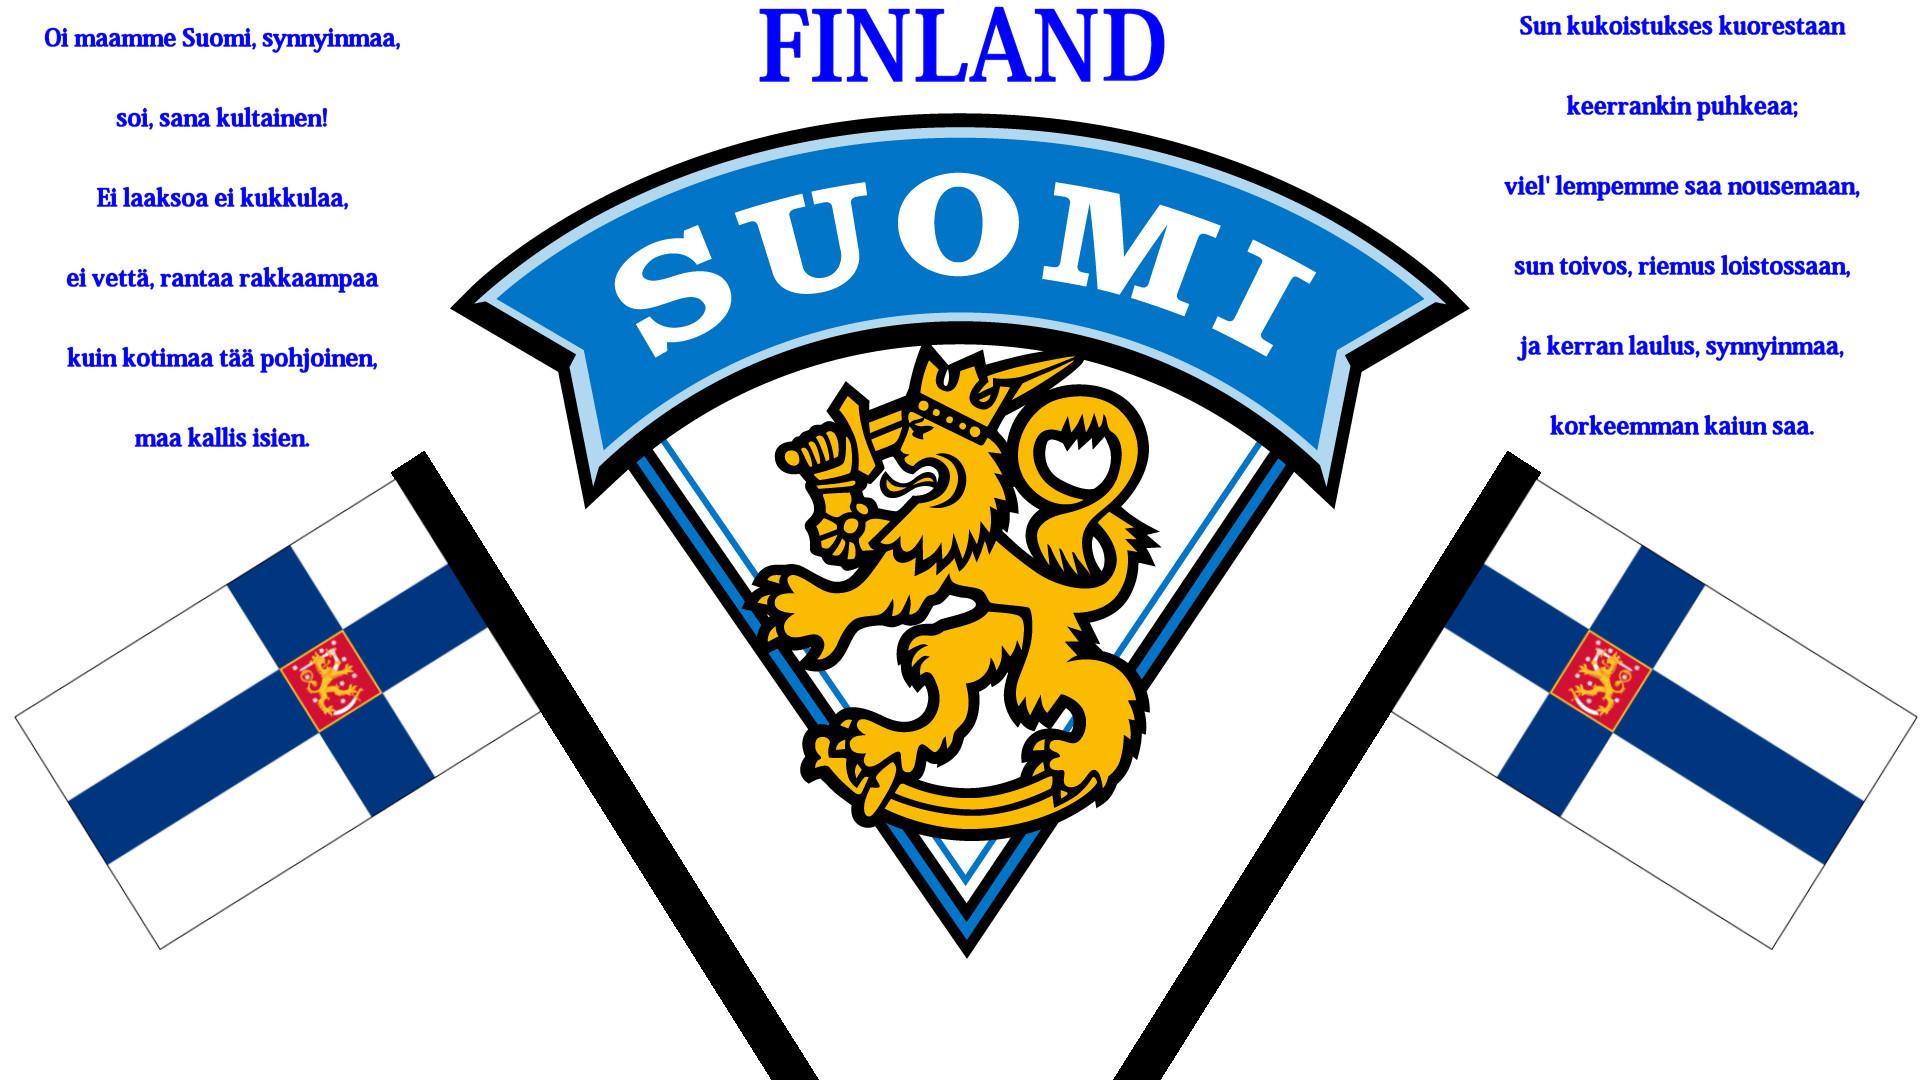 Finland Ice Hockey Wallpaper by shadowthehedgehog377 Finland Ice Hockey  Wallpaper by shadowthehedgehog377